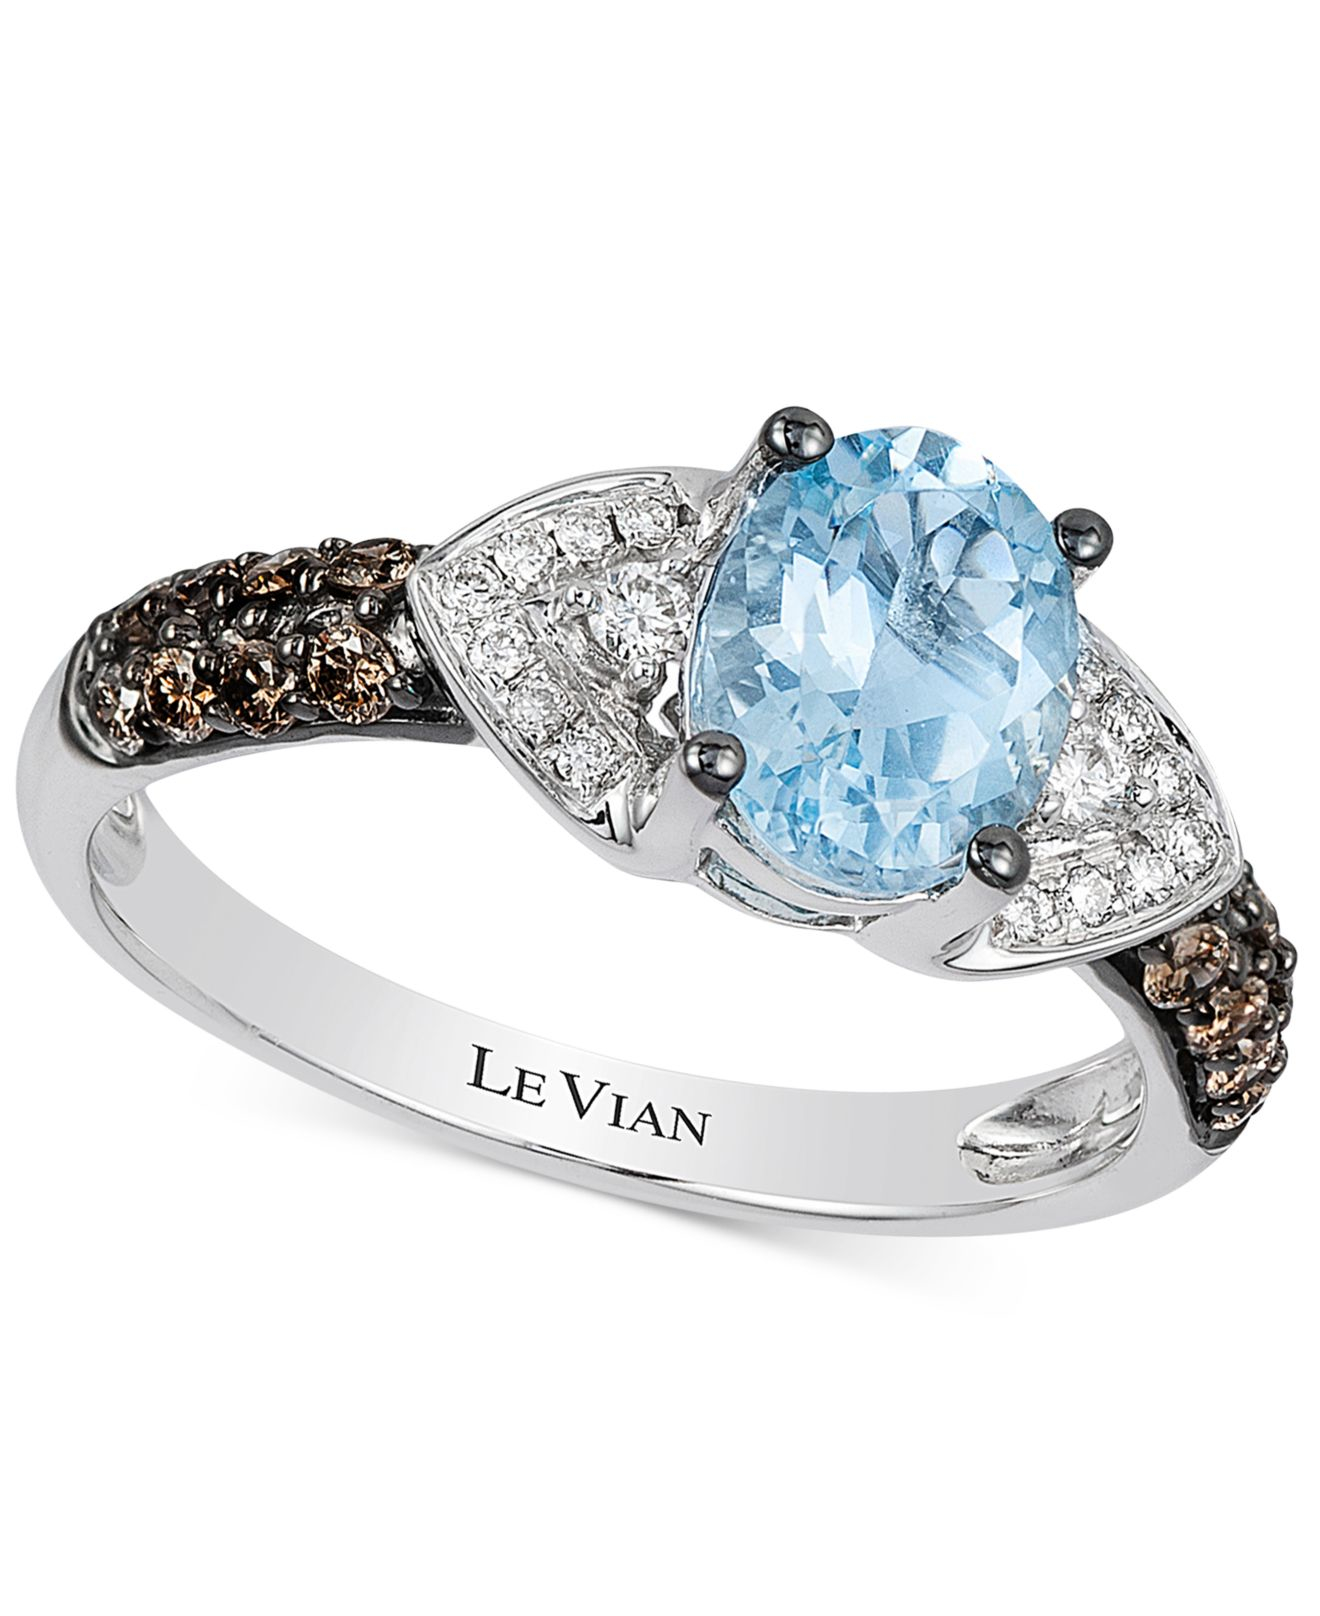 Le vian Aquamarine 1 Ct T w And Diamond 1 3 Ct T w Ring In